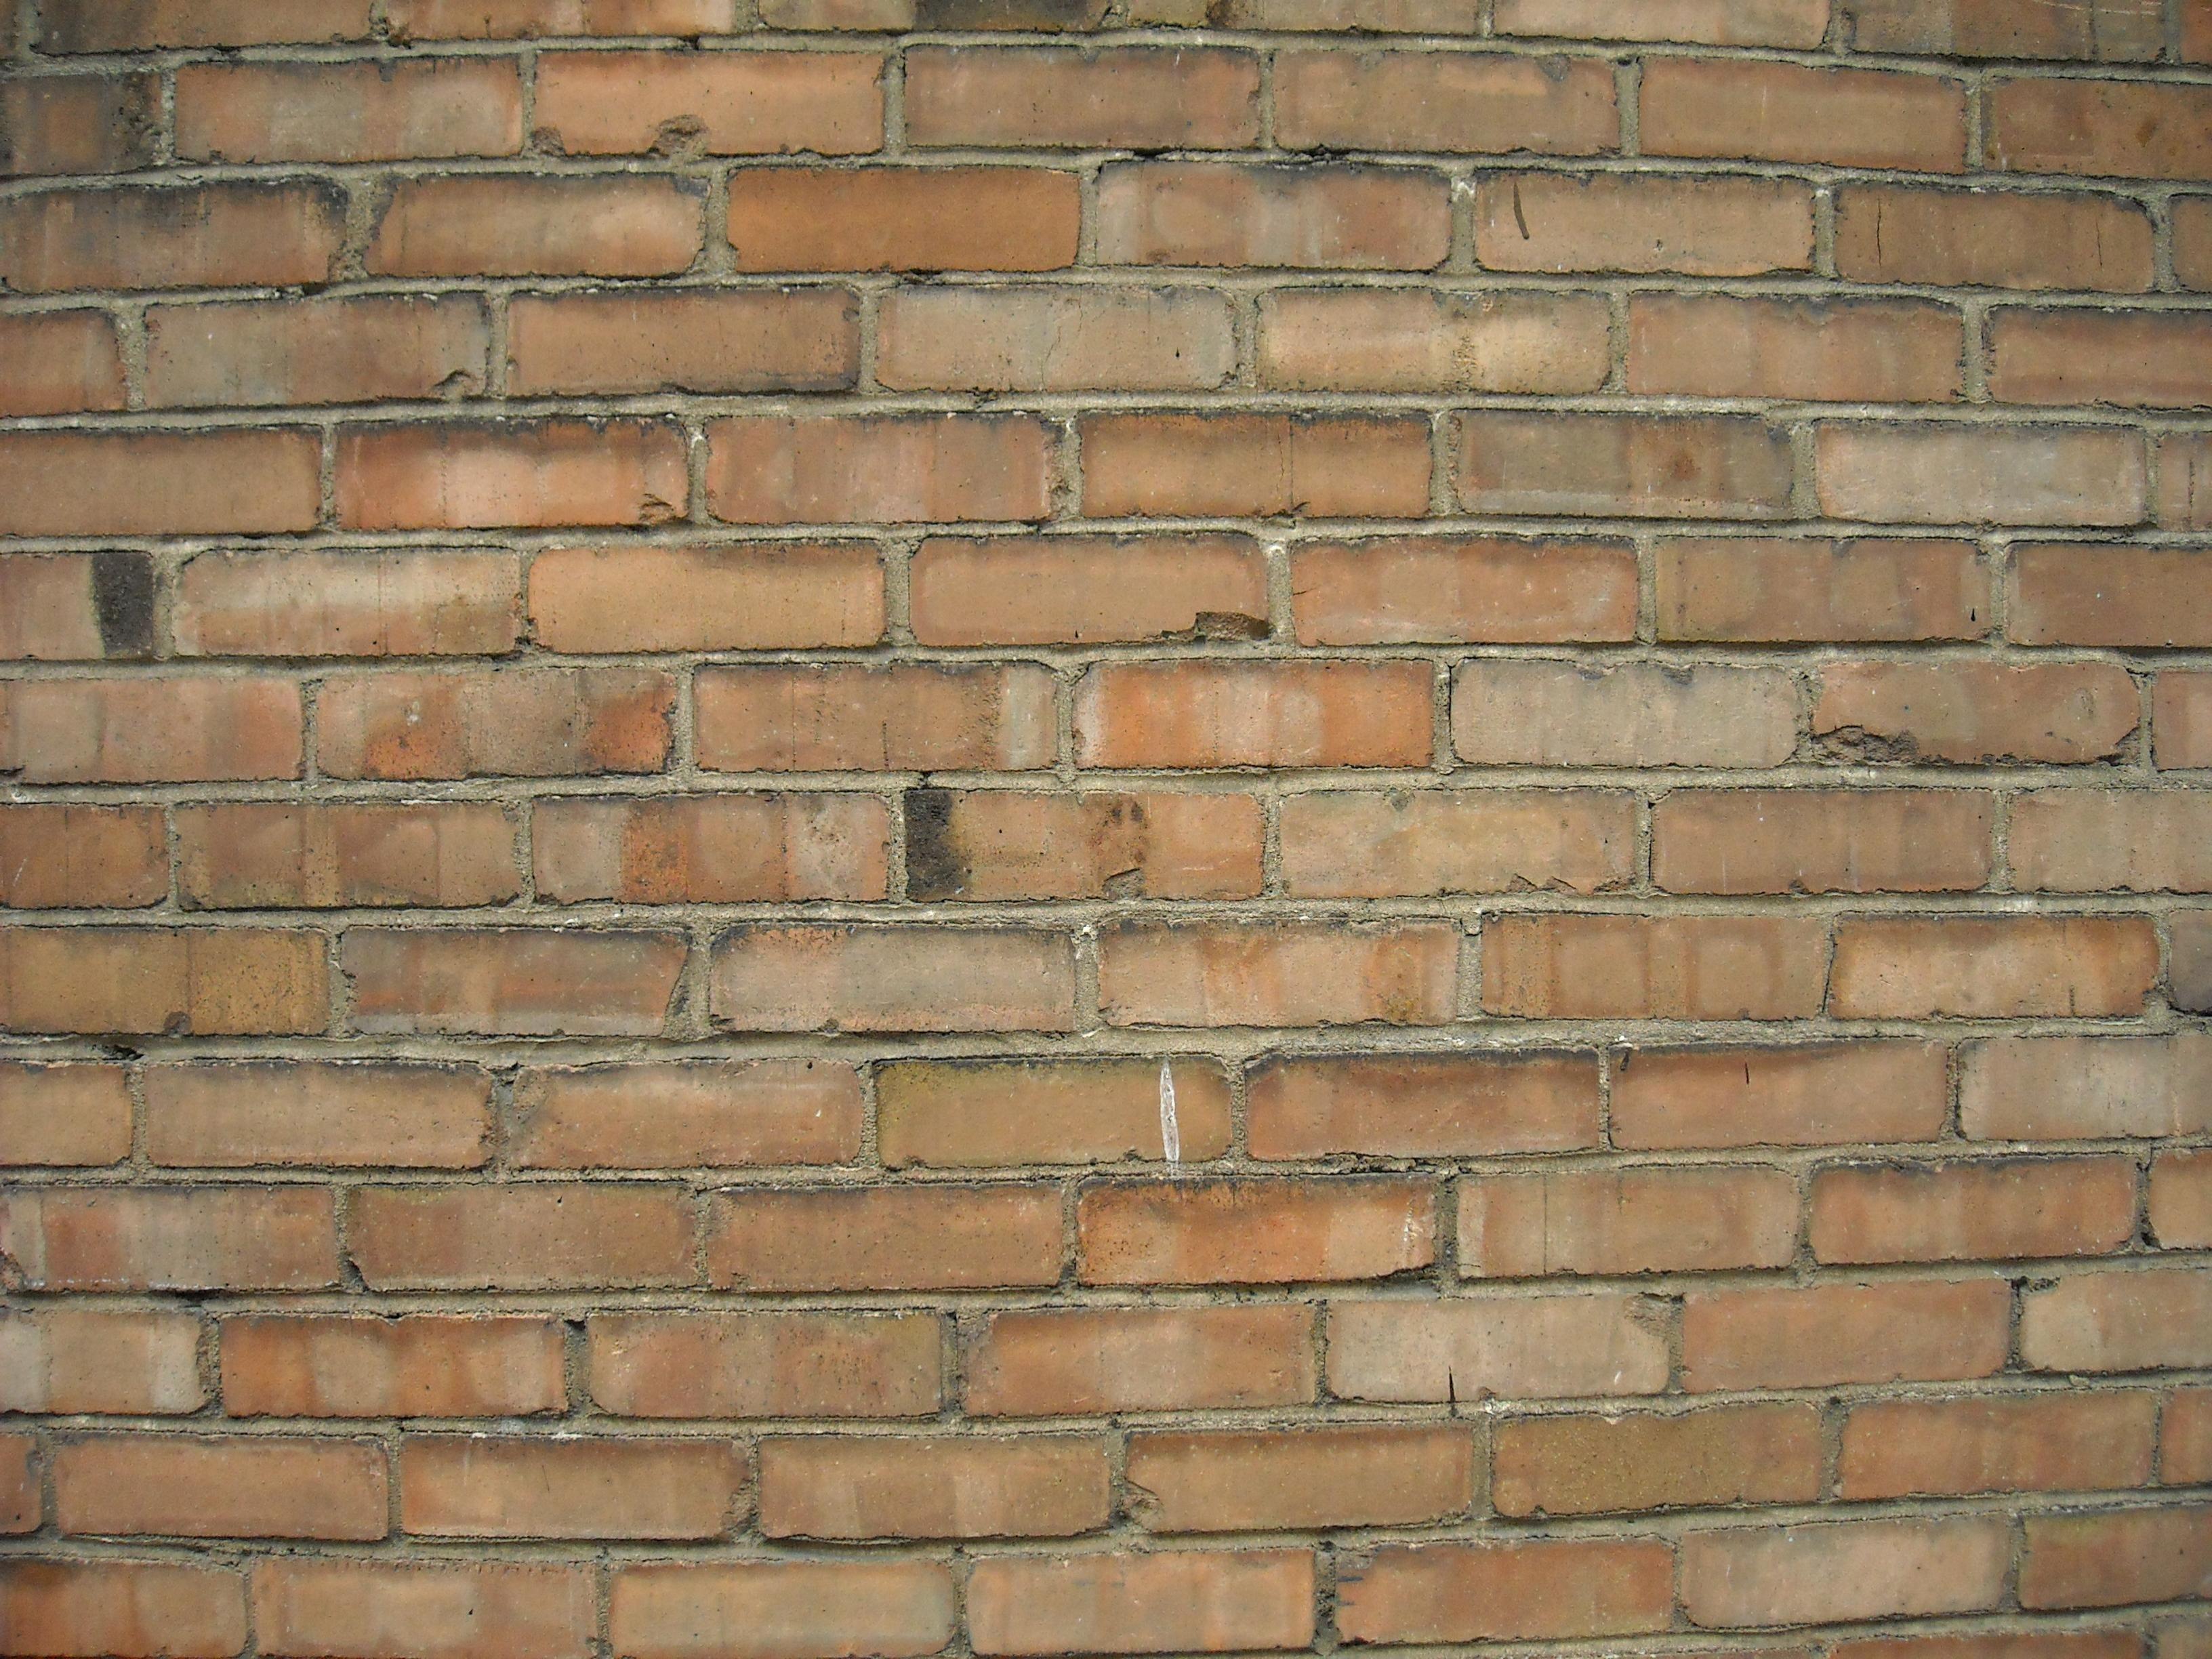 File:Brick hd texture.jpg - Wikimedia Commons